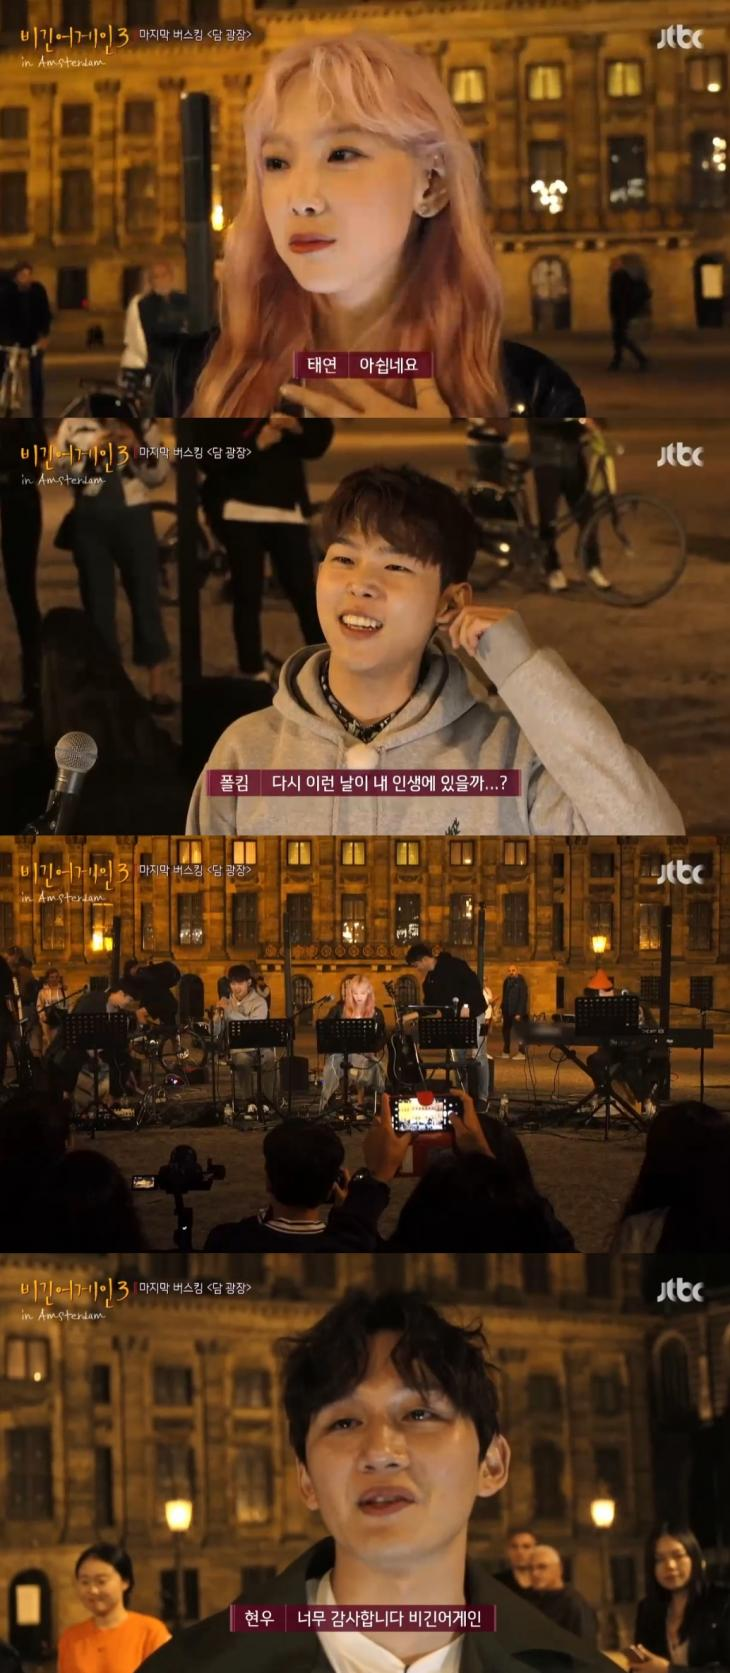 JTBC 예능프로그램 '비긴어게인3'